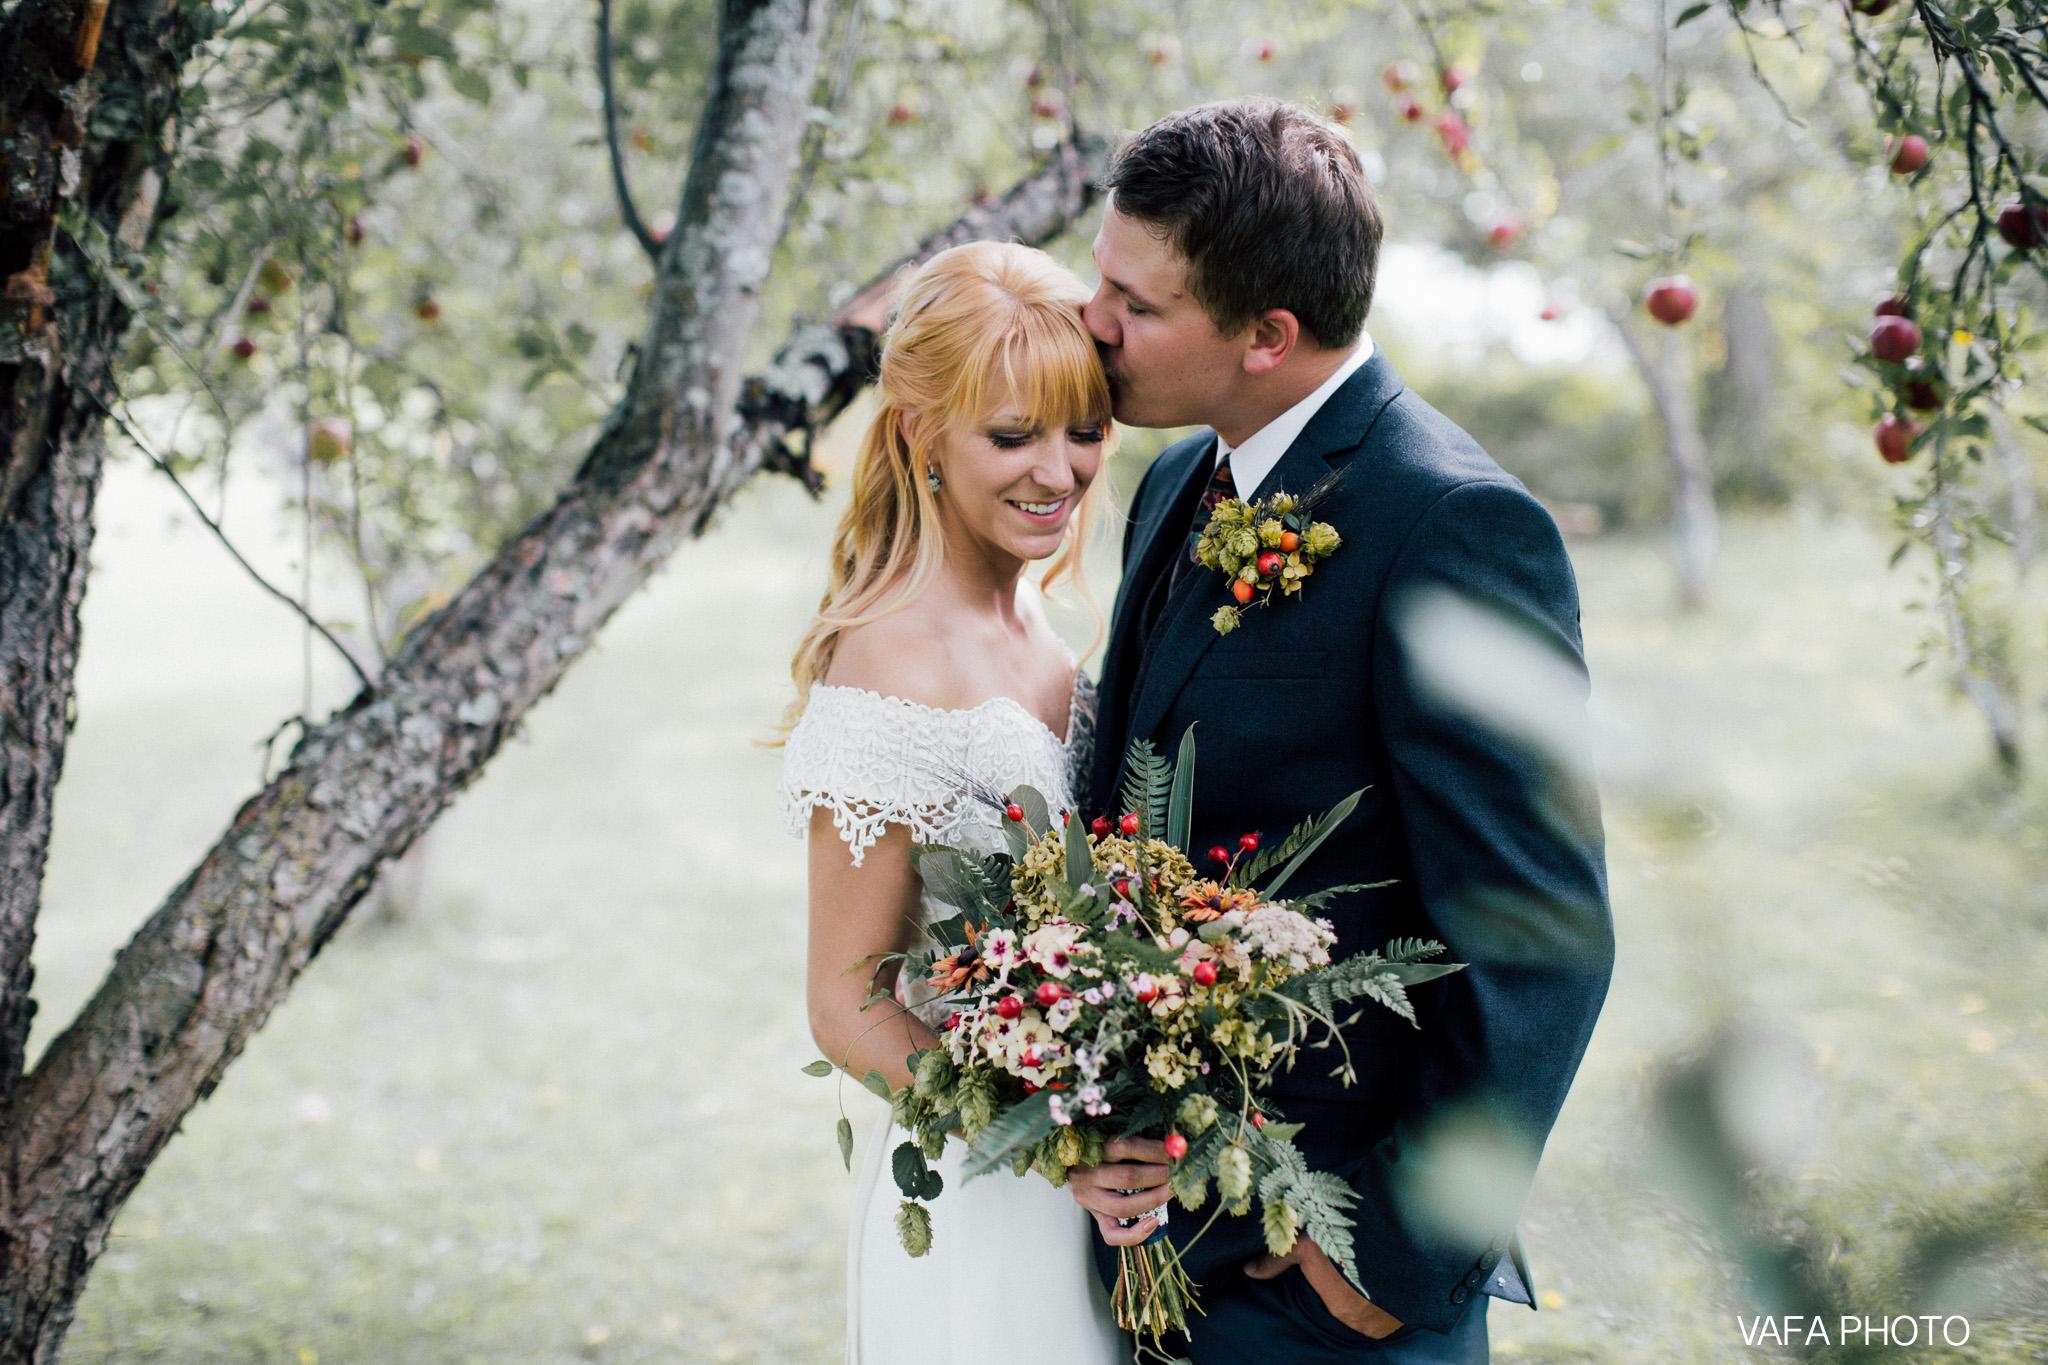 Belsolda-Farm-Wedding-Christy-Eric-Vafa-Photo-85.jpg